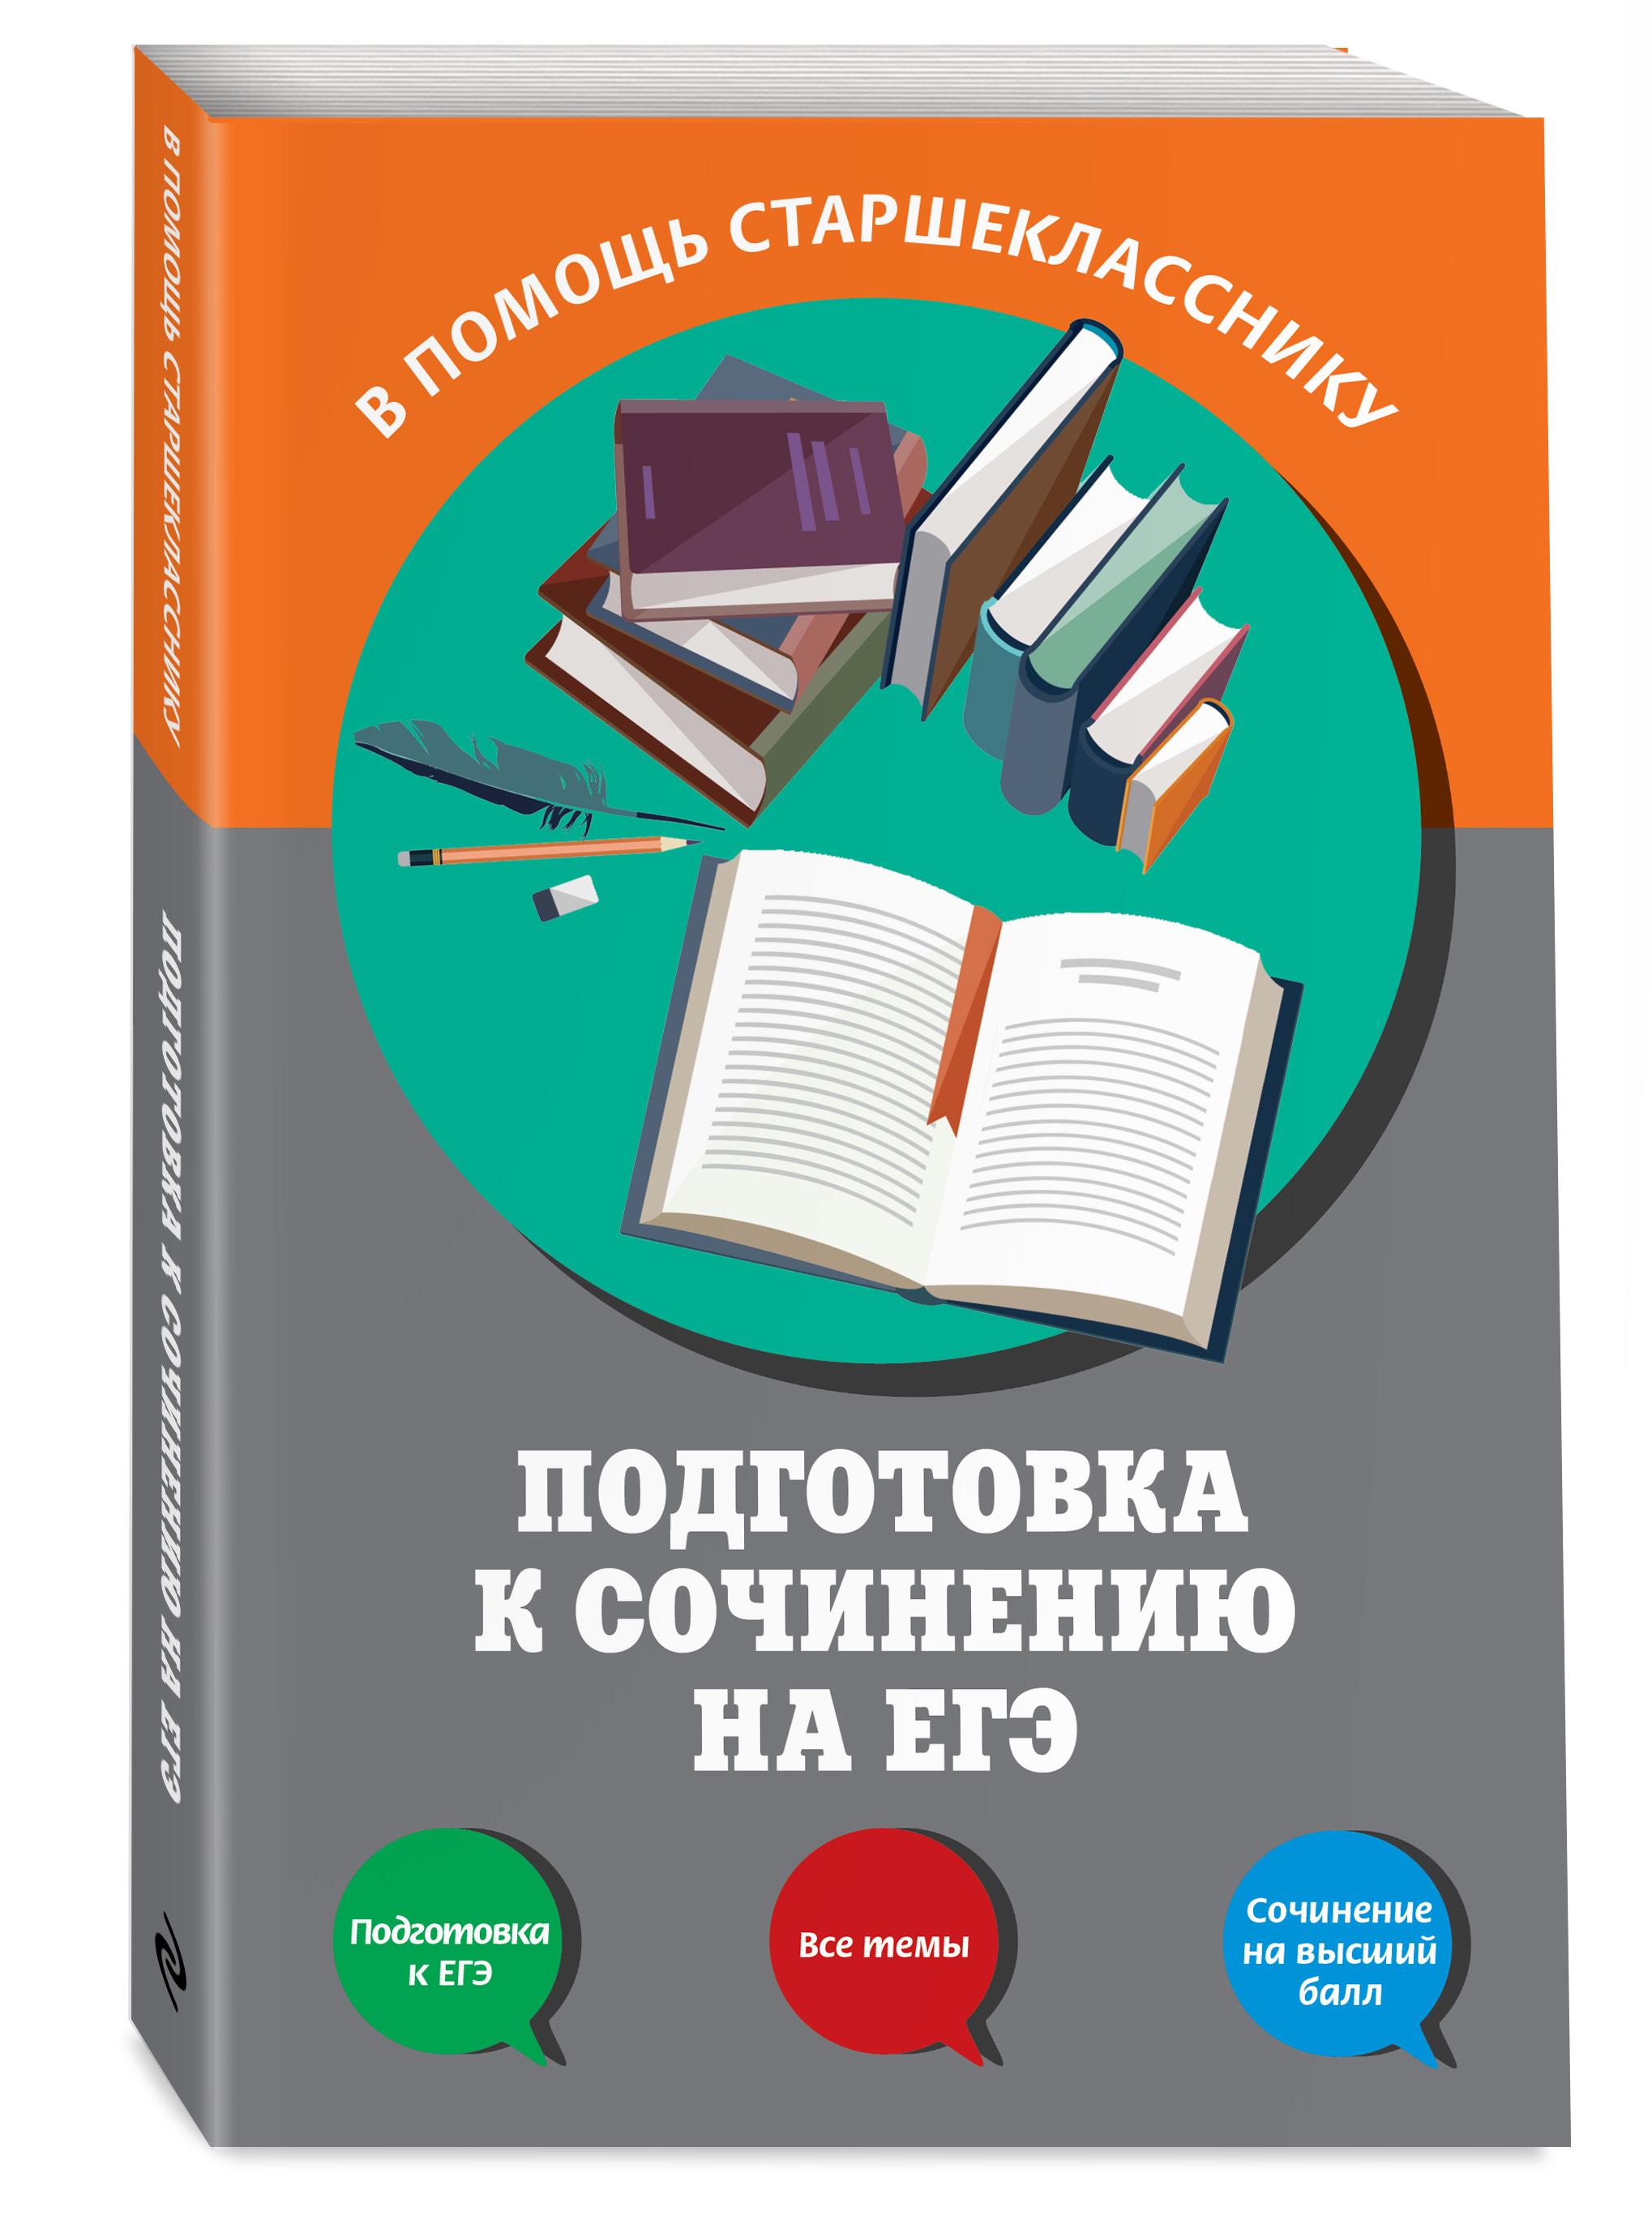 Подготовка к сочинению на ЕГЭ ( Черкасова Л.Н., Попова Е.В.  )